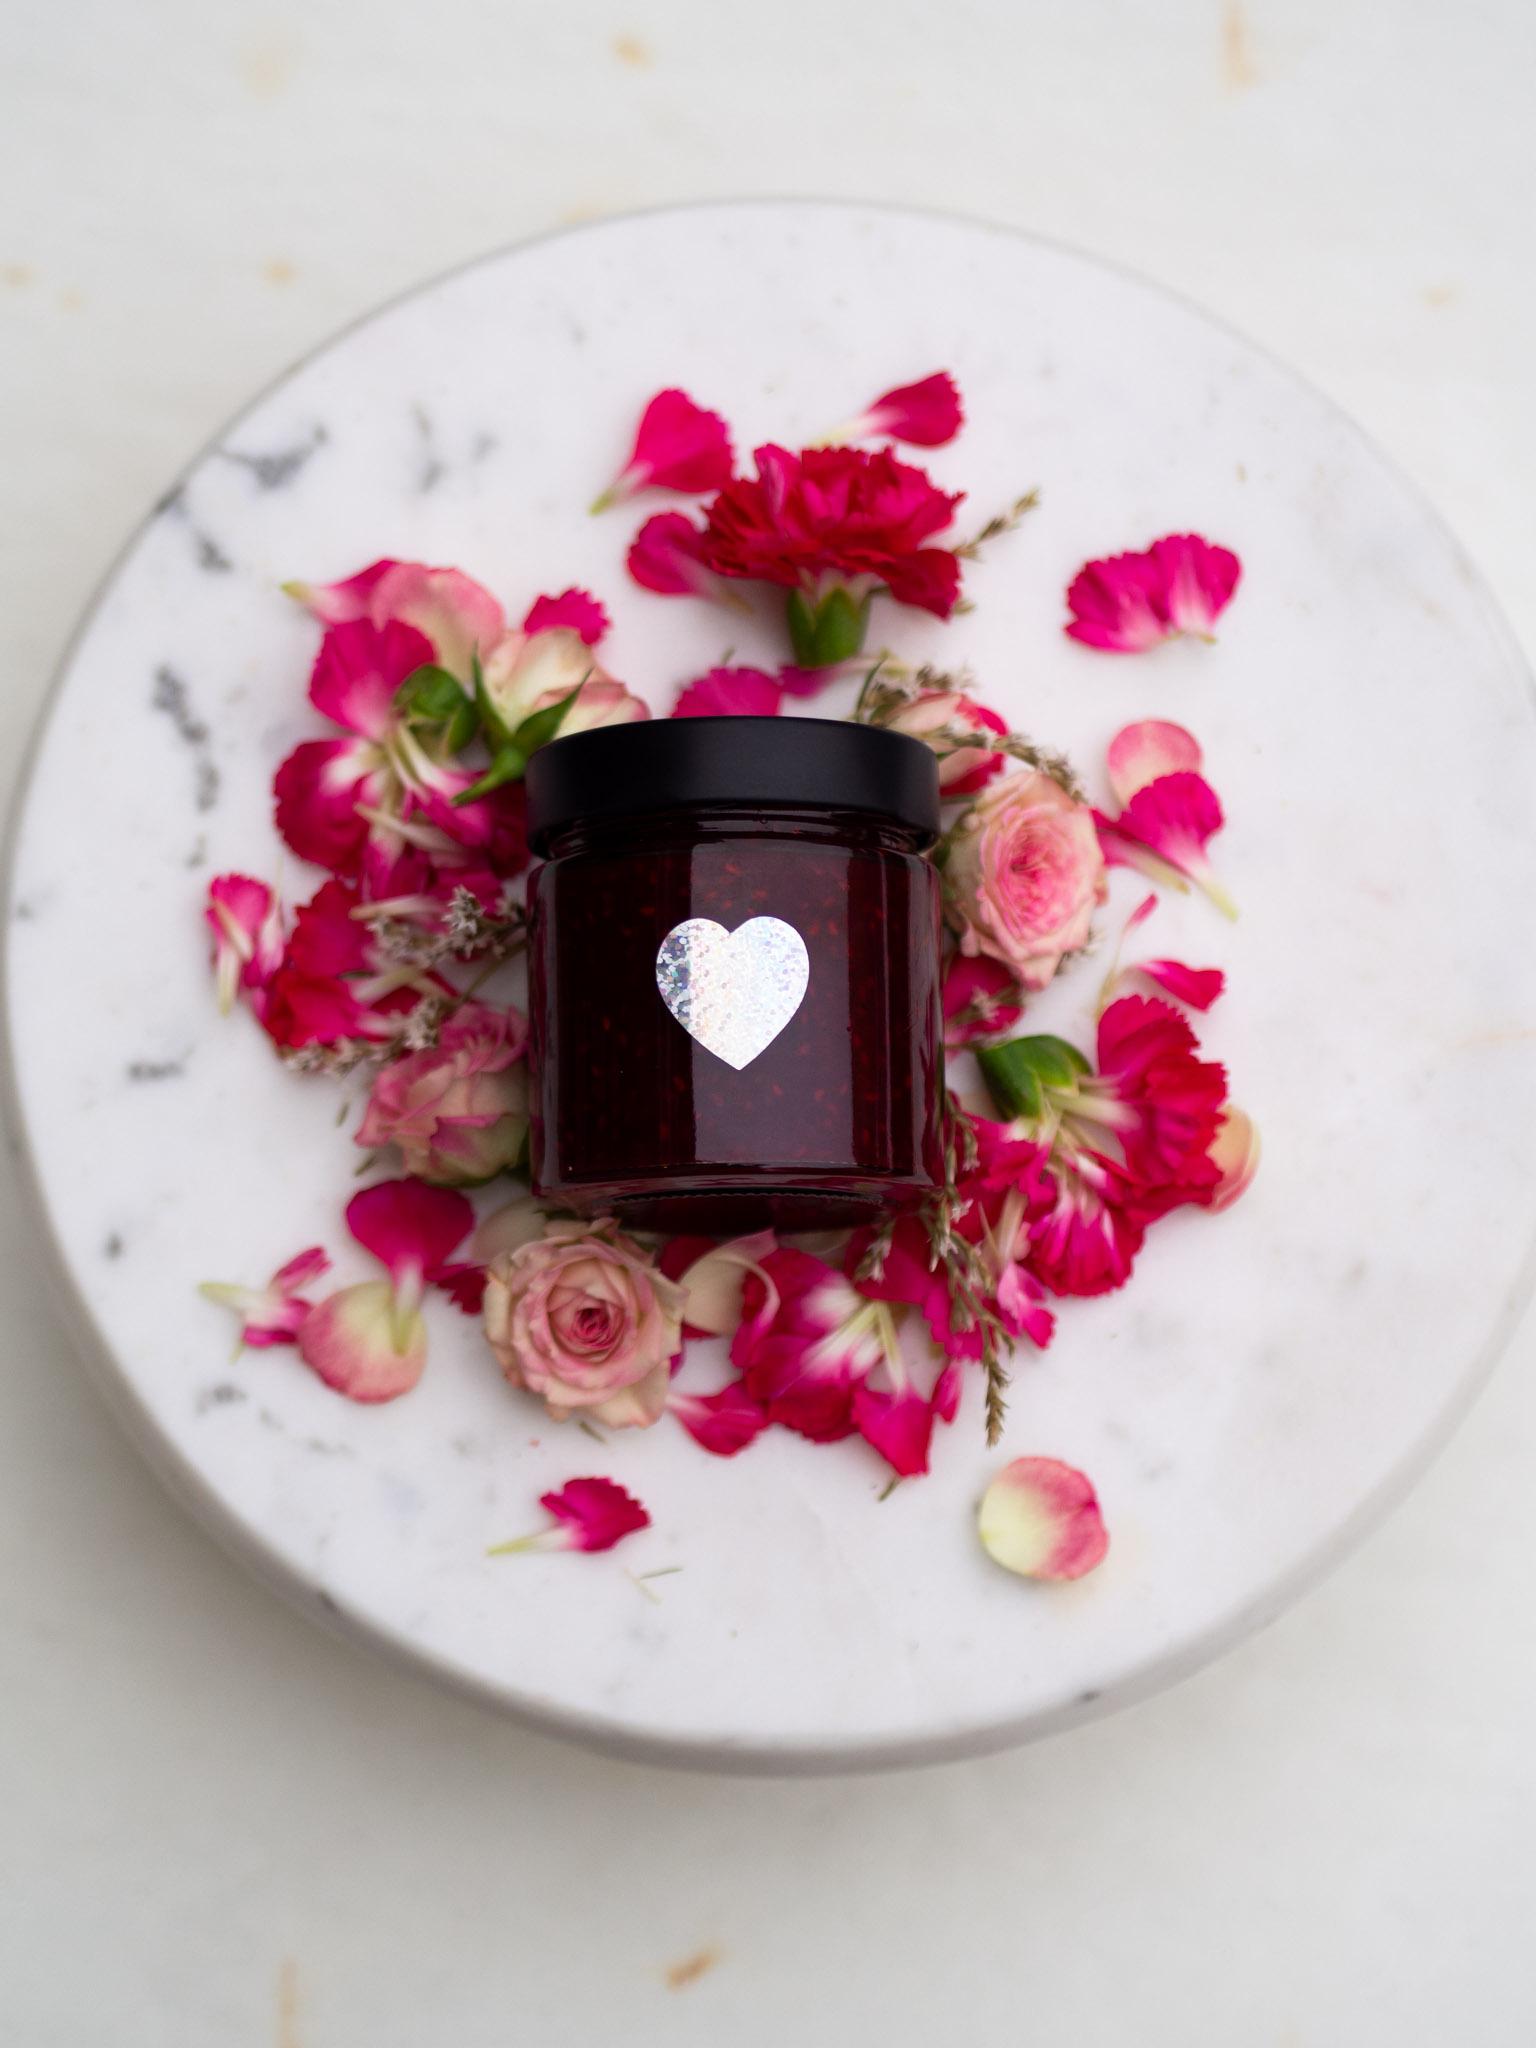 Himbeer-Litschi Konfitüre Extra mit Rosenblüten, 200ml